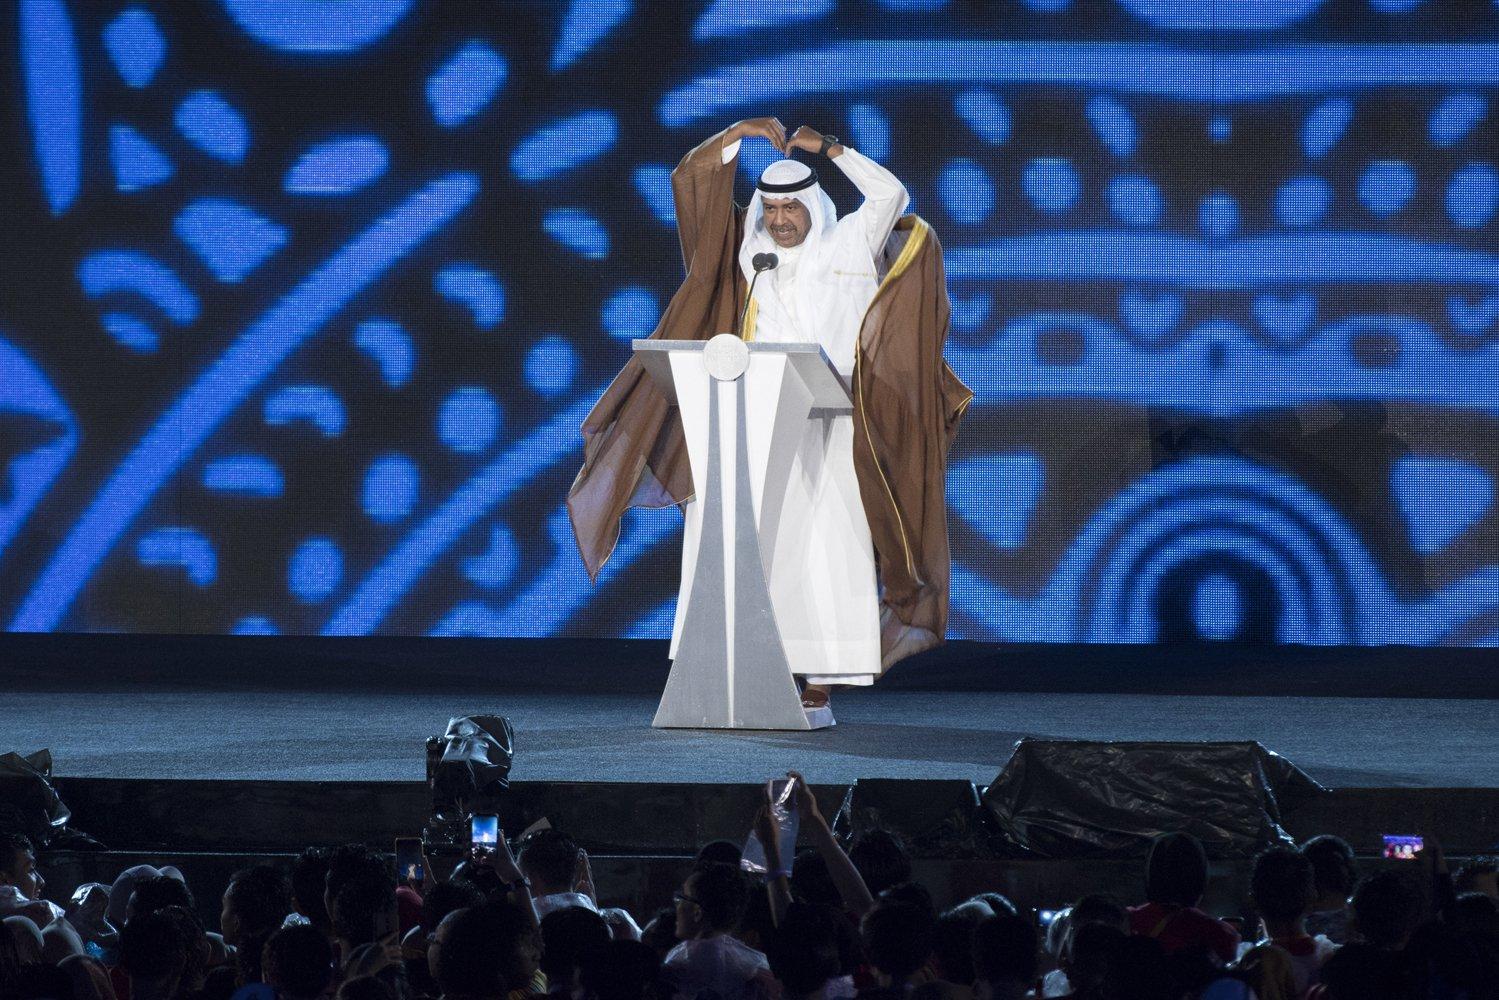 Presiden Dewan Olimpiade Asia (OCA) Sheikh Ahmad Al Fahad Al Sabah memberi sambutan dalam Upacara Penutupan Asian Games ke-18 Tahun 2018 di Stadion Utama GBK, Senayan, Jakarta, Minggu (2/9).